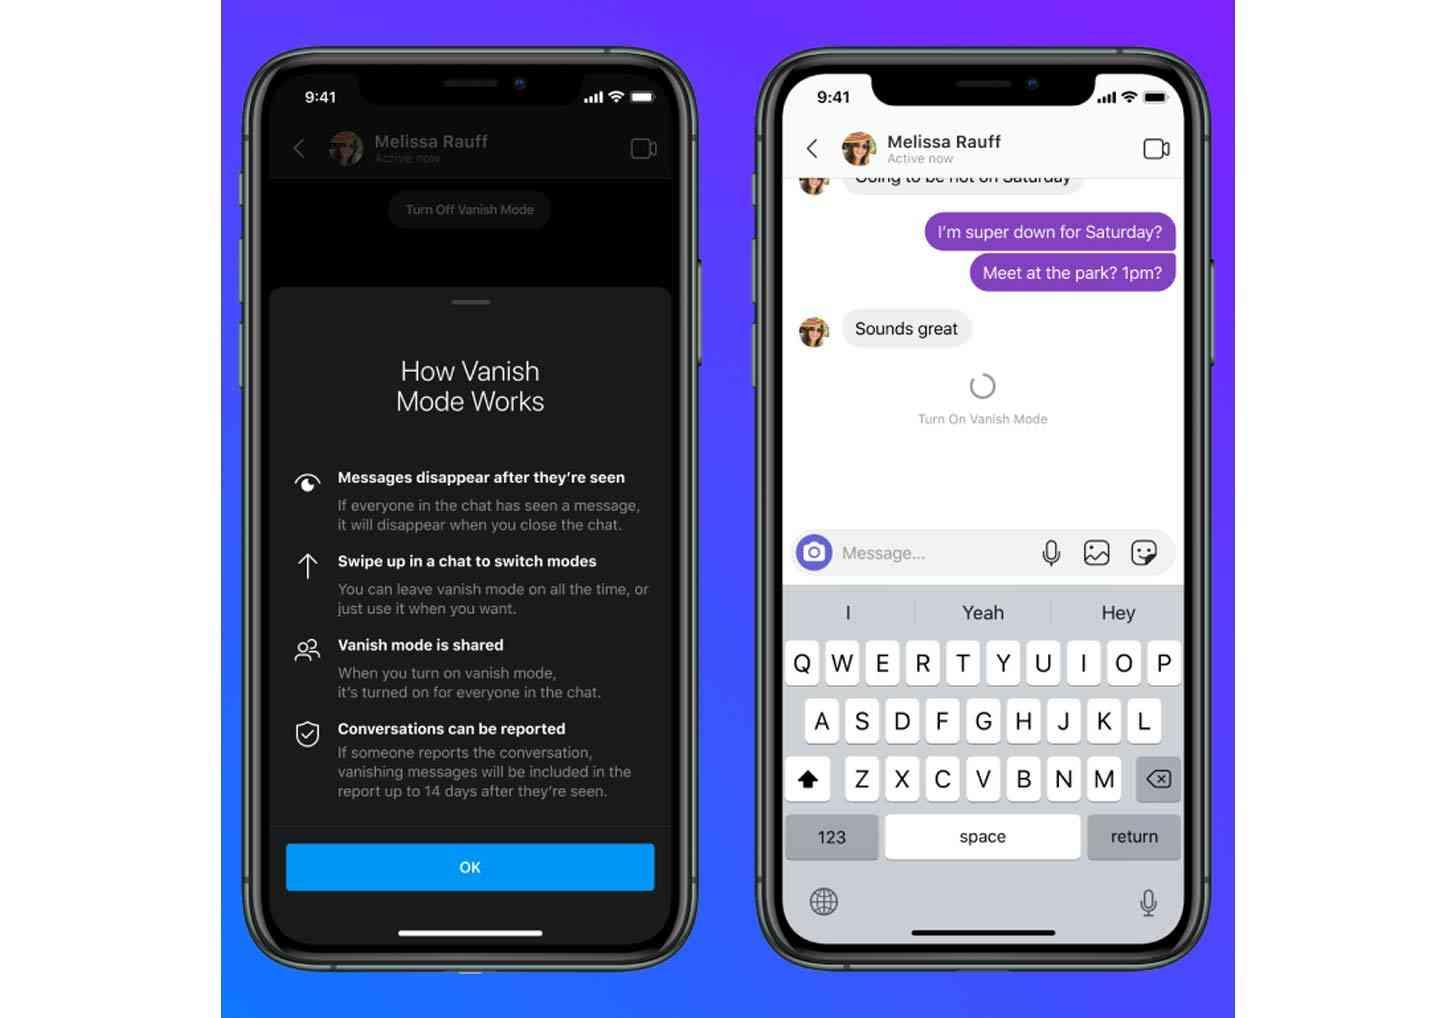 Facebook Messenger Vanish Mode features